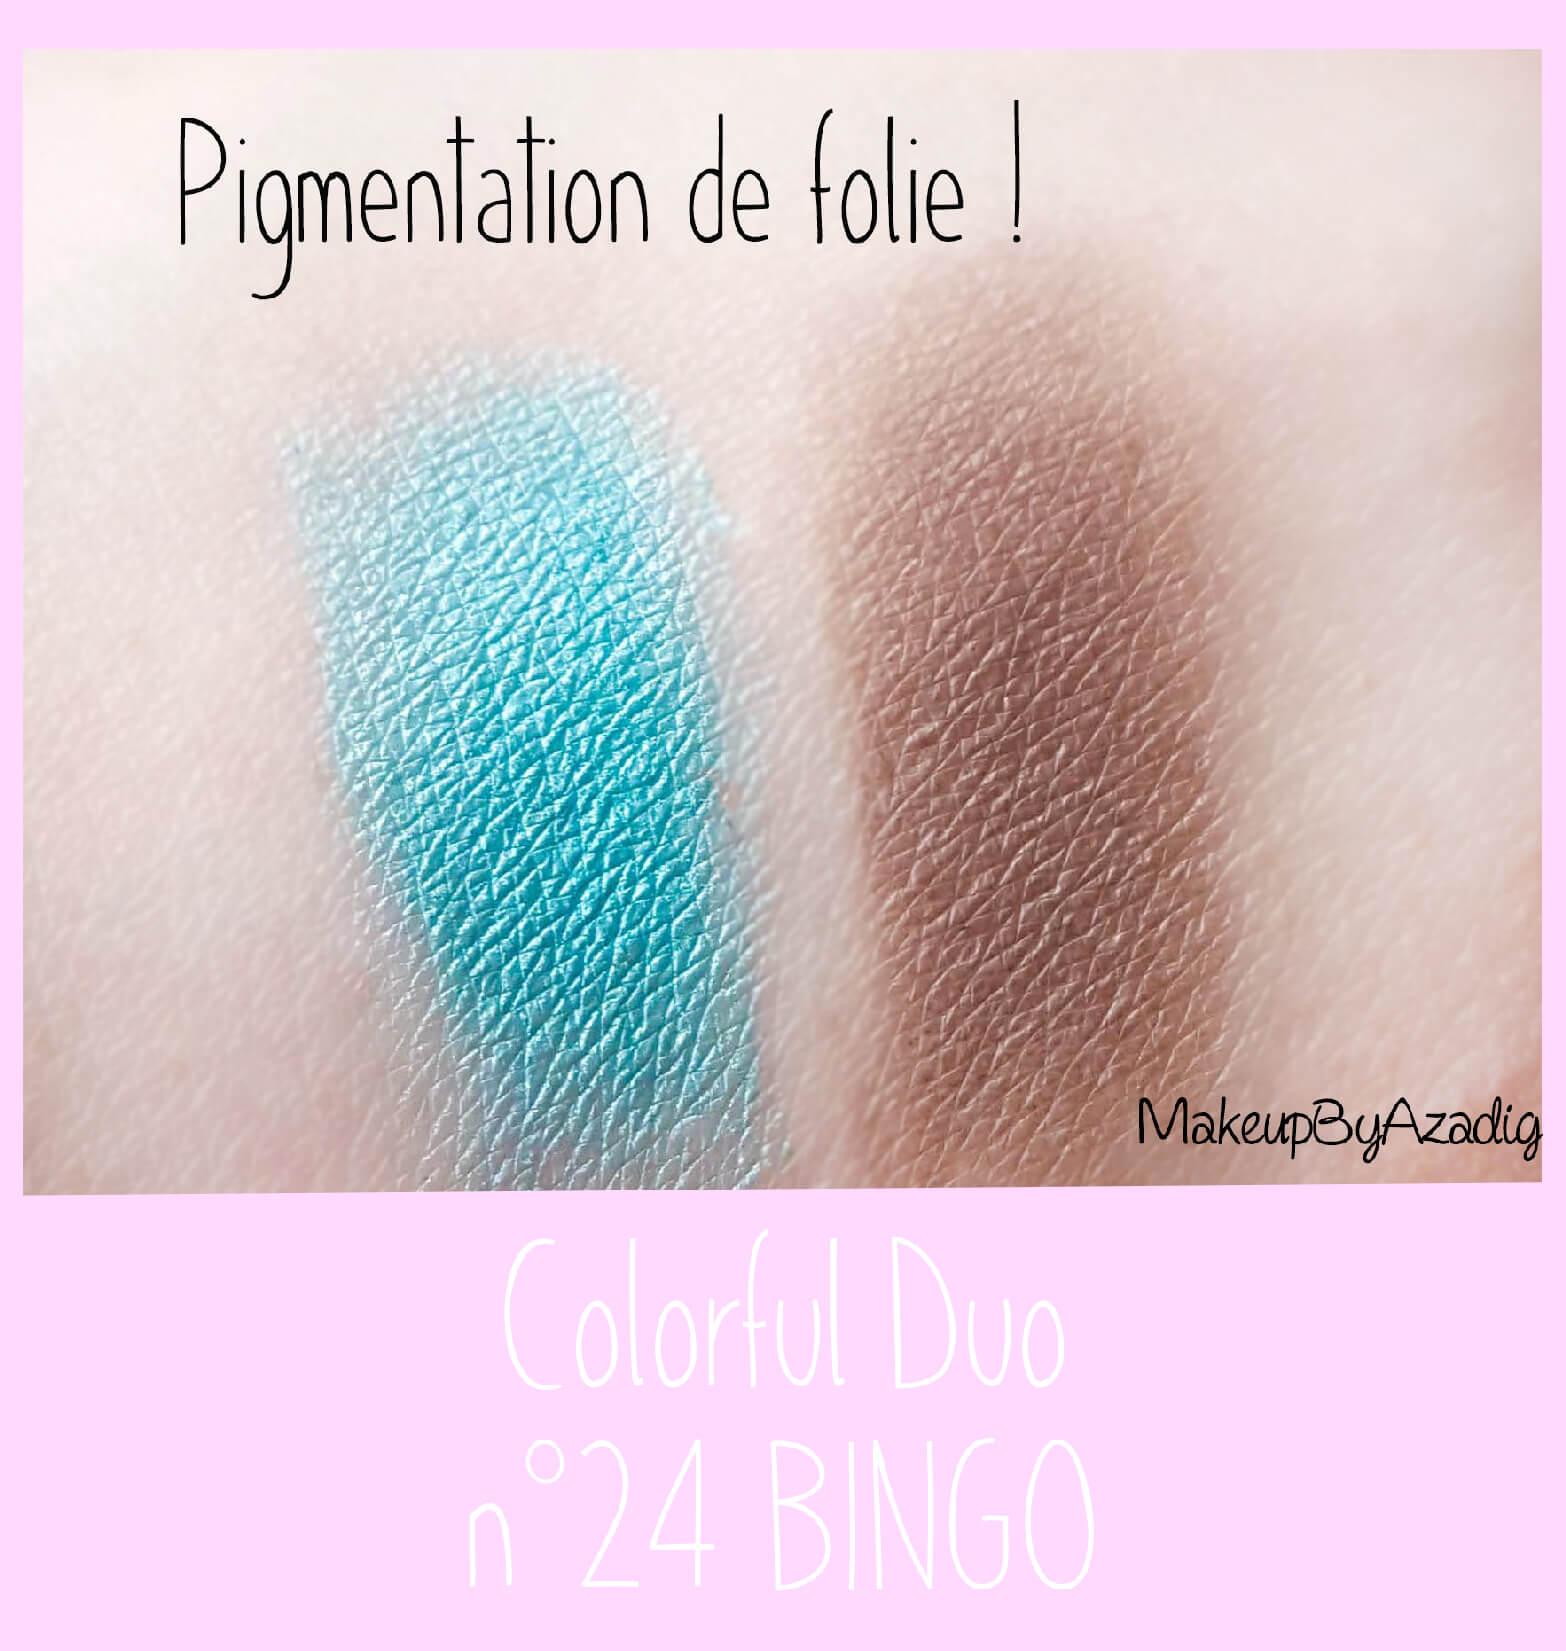 swatches-bingo-colorful-duo-ombres-a-paupieres-sephora-madeinsephora-hivency-partenariat-makeupbyazadig